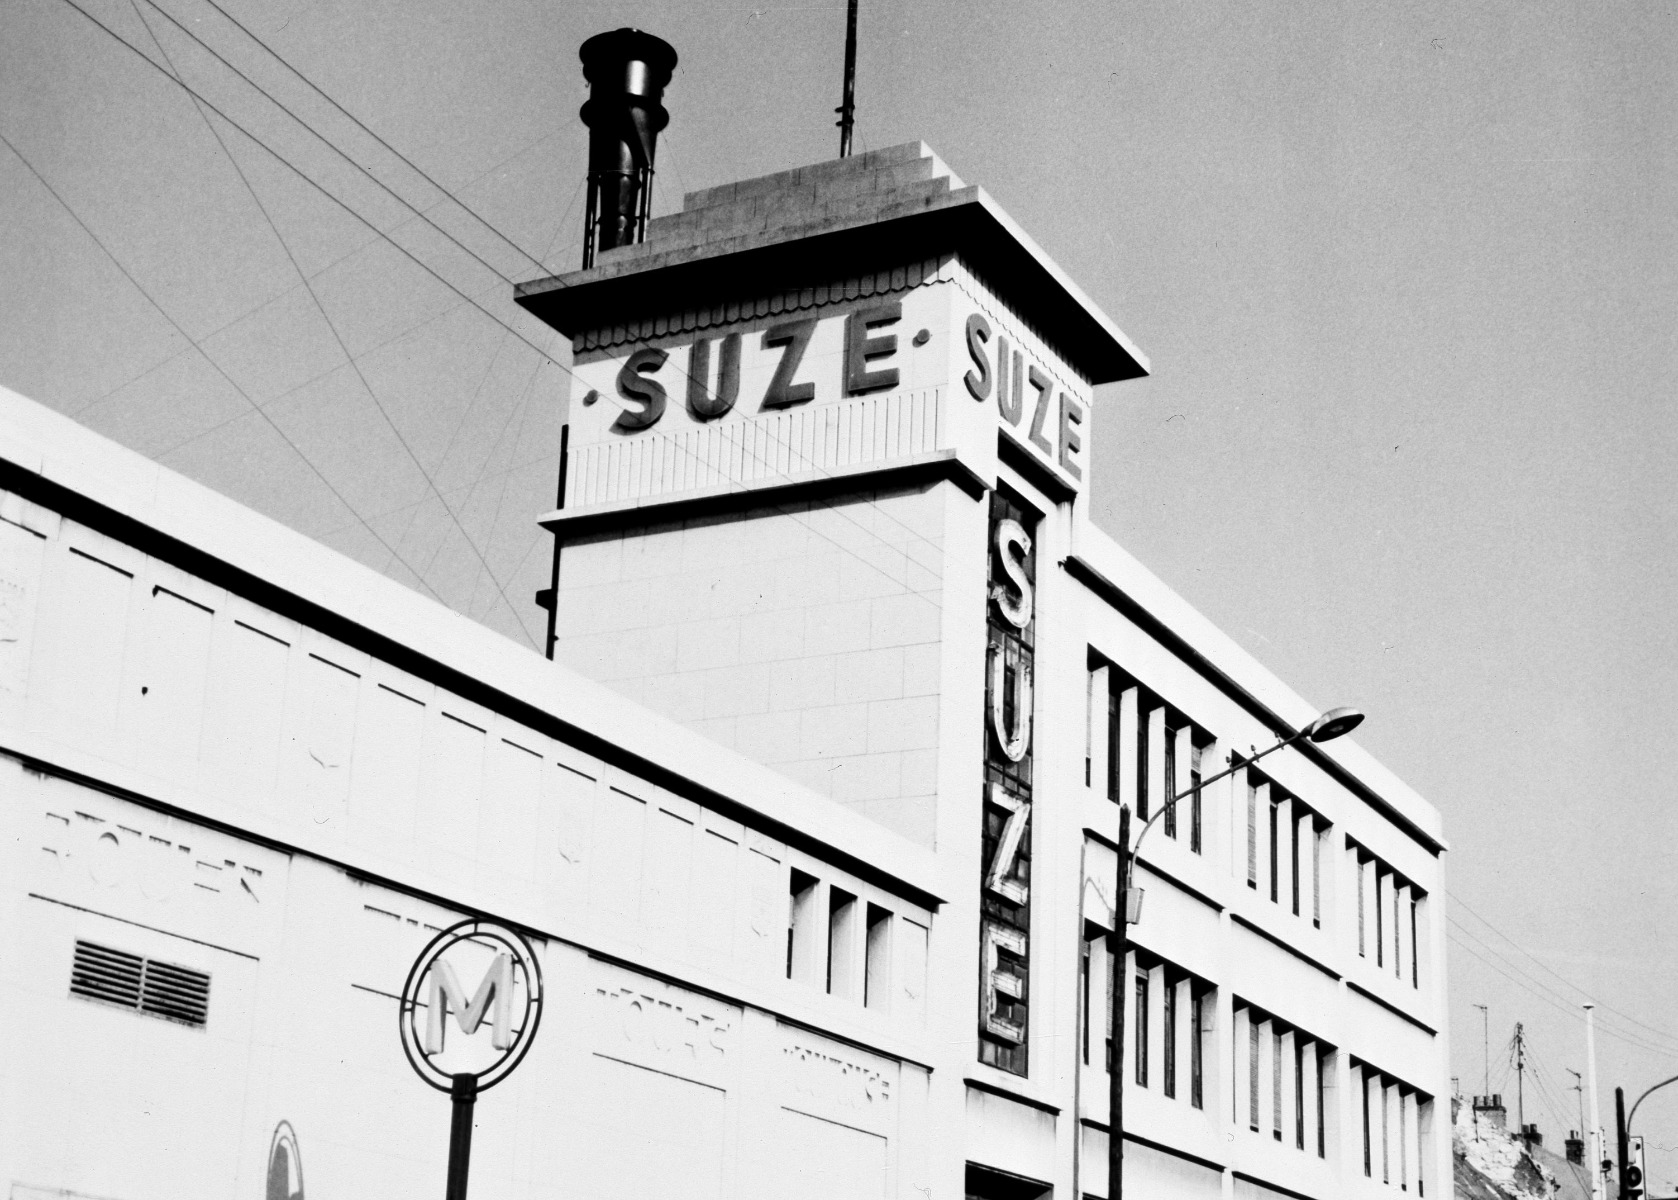 suze_contenu_4_1